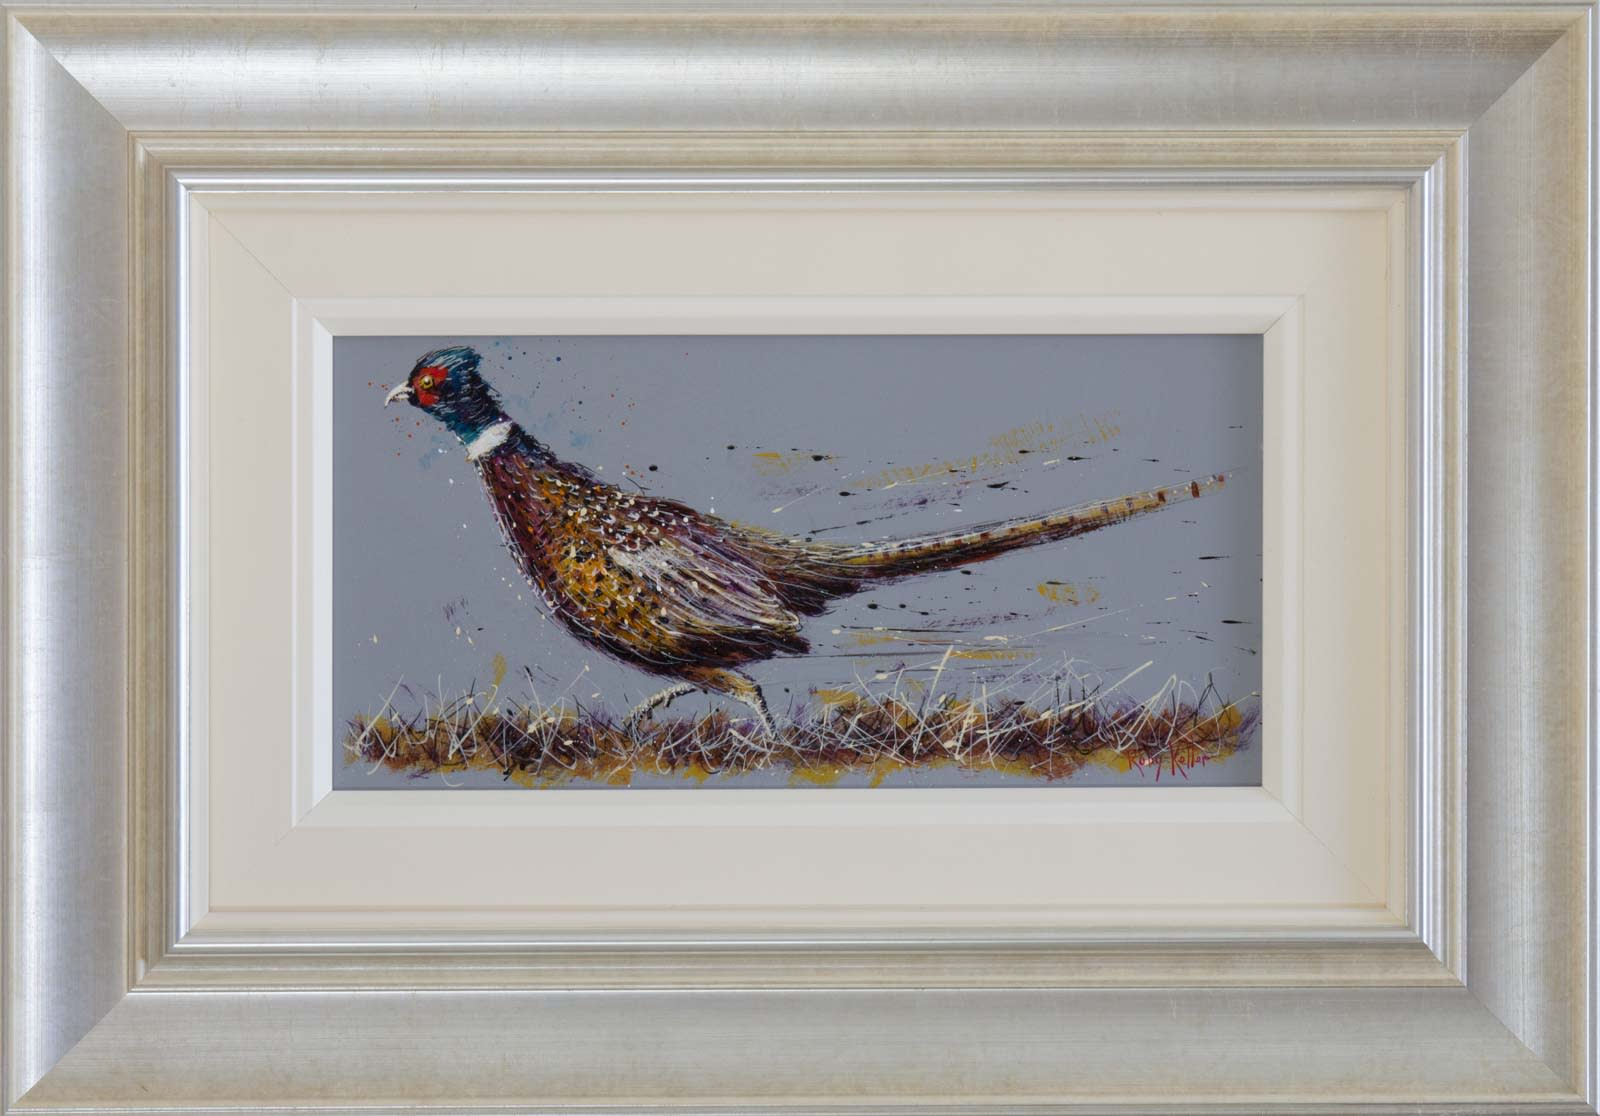 Running Pheasant, Ruby Keller